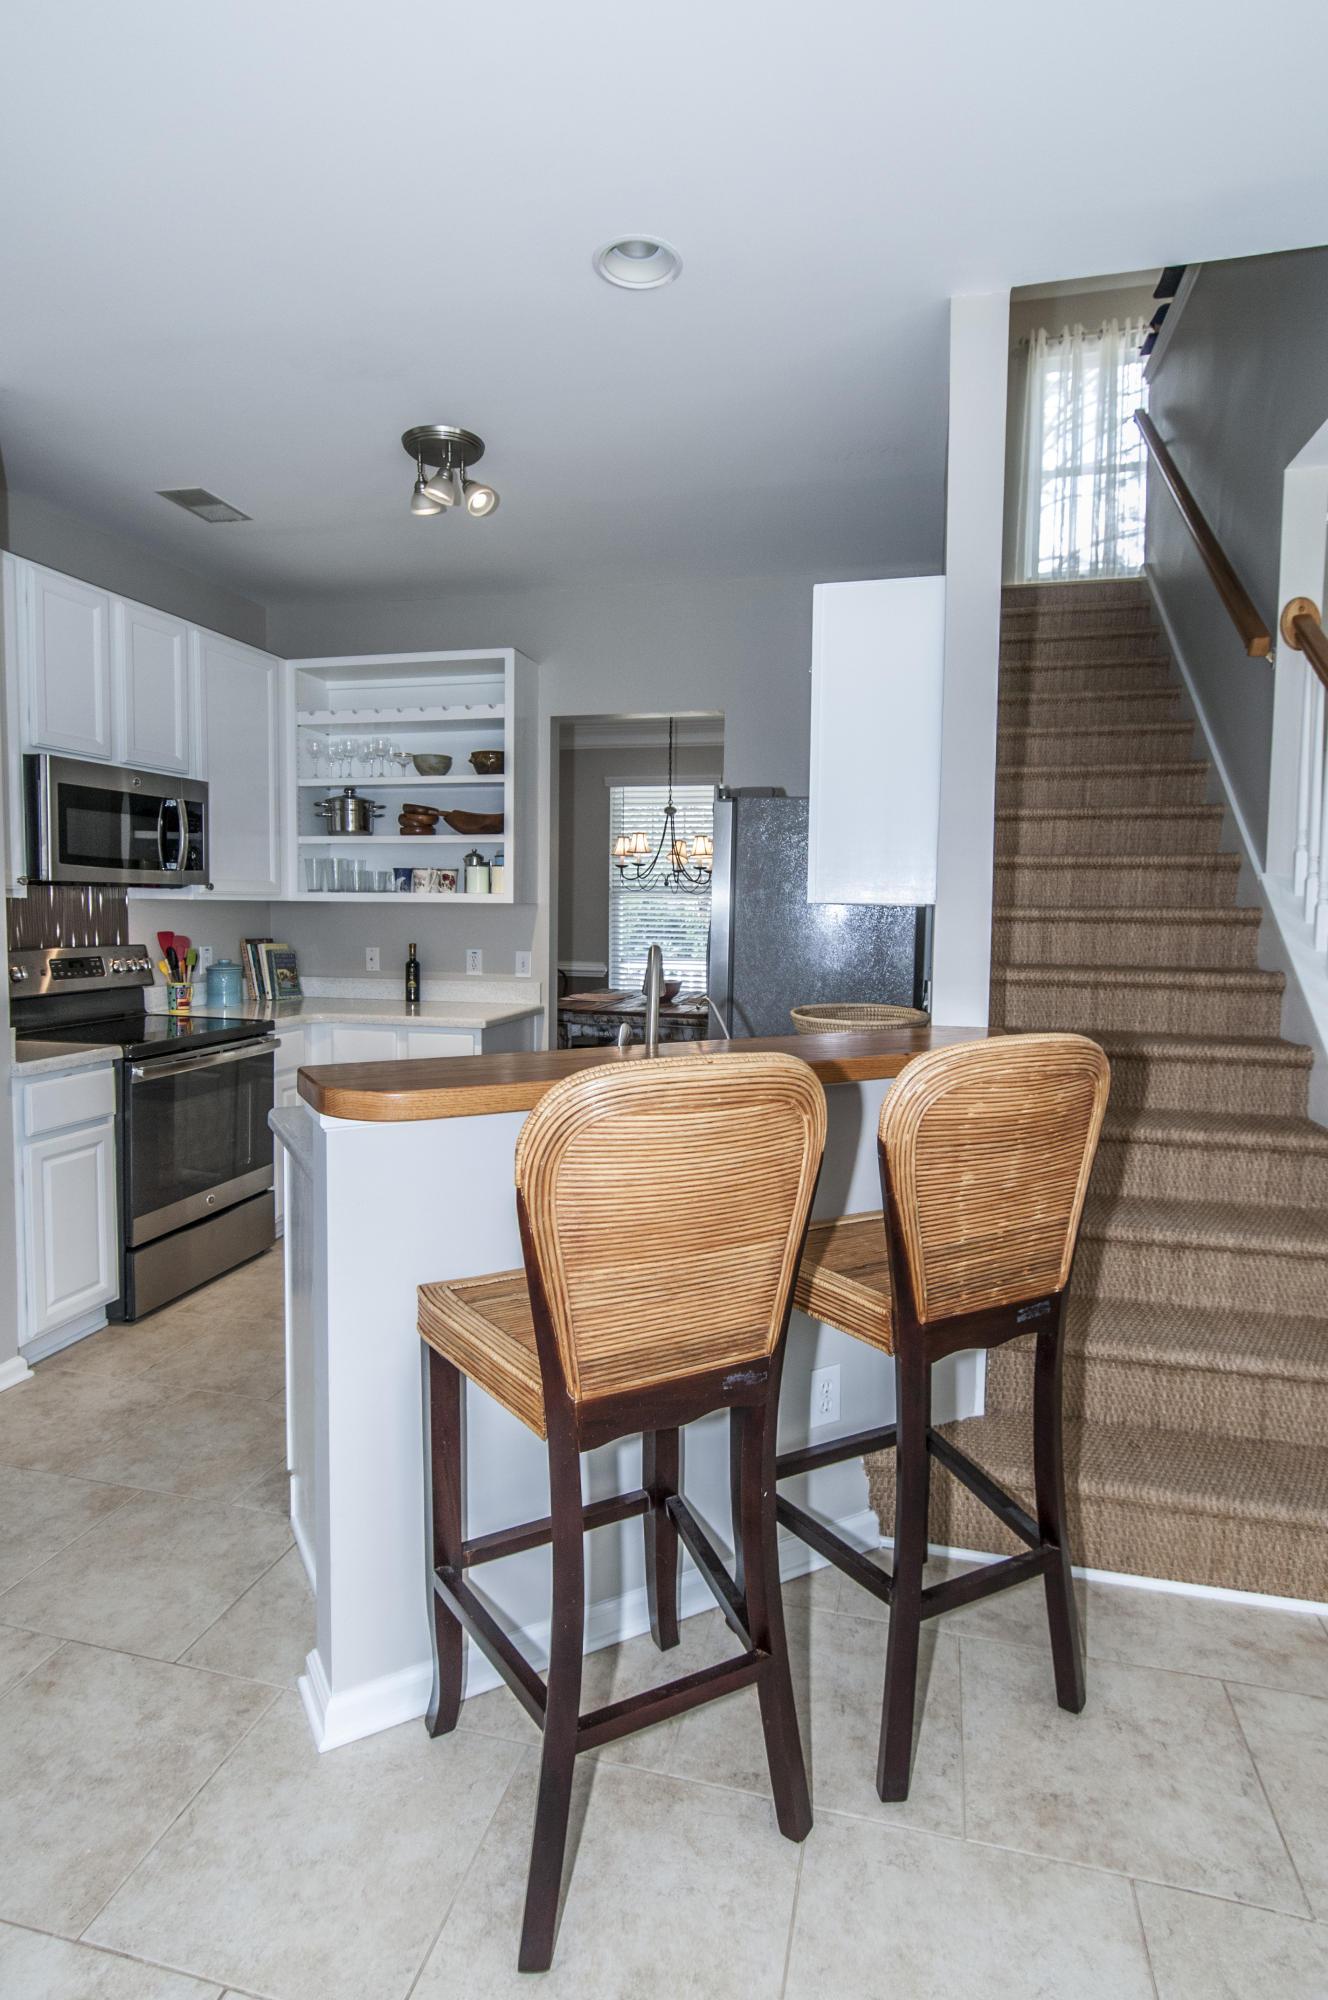 Etiwan Park Homes For Sale - 115 Brady, Daniel Island, SC - 37